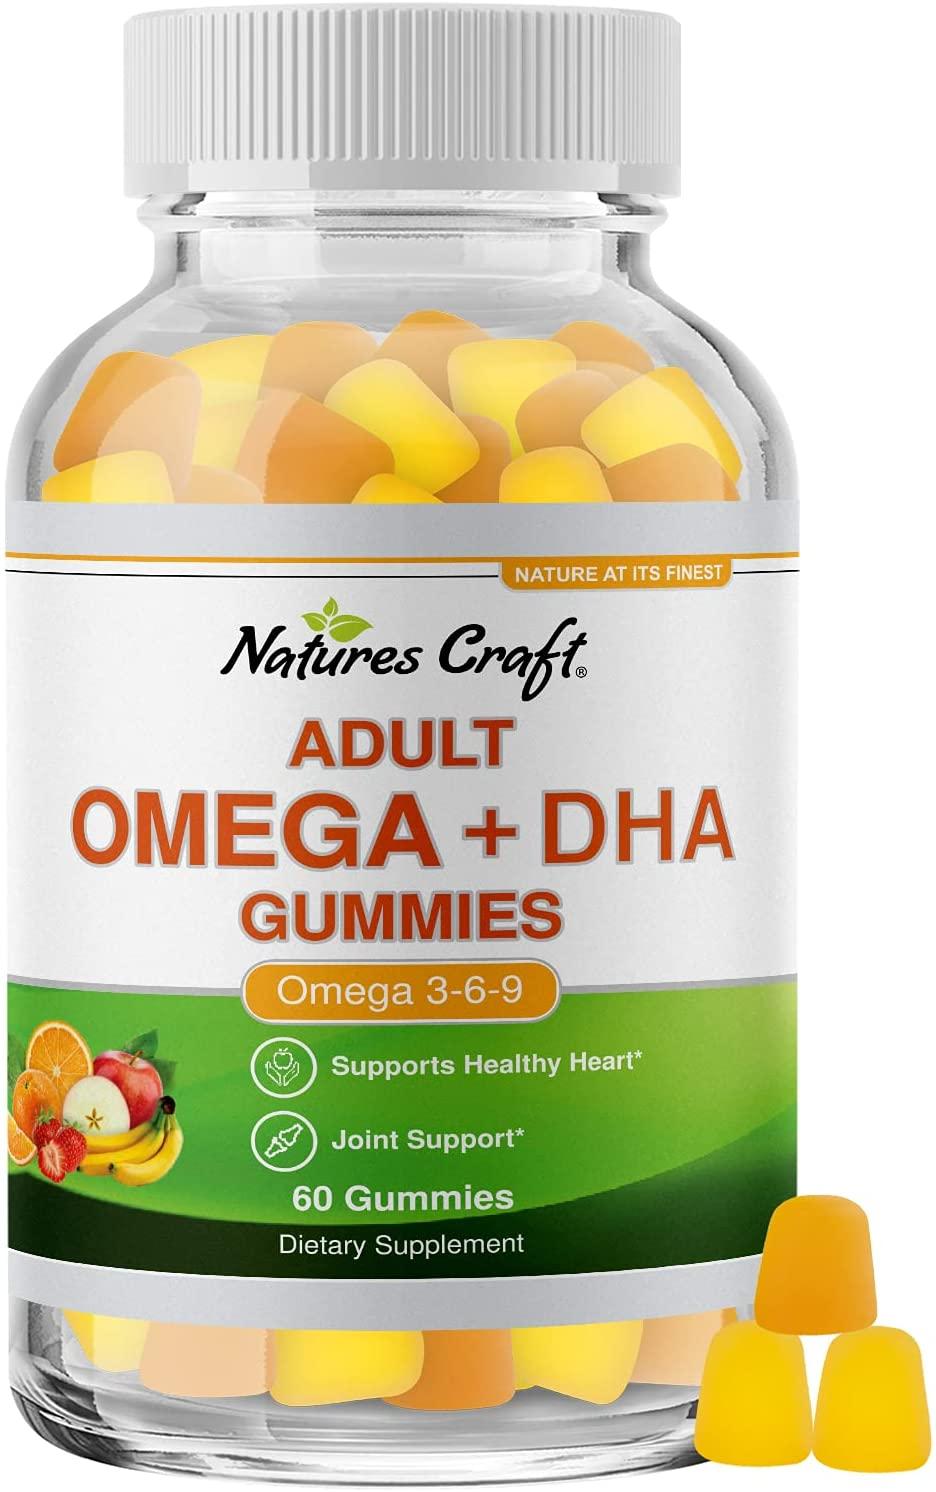 Natures Craft Adult Omega + DHA Gummies